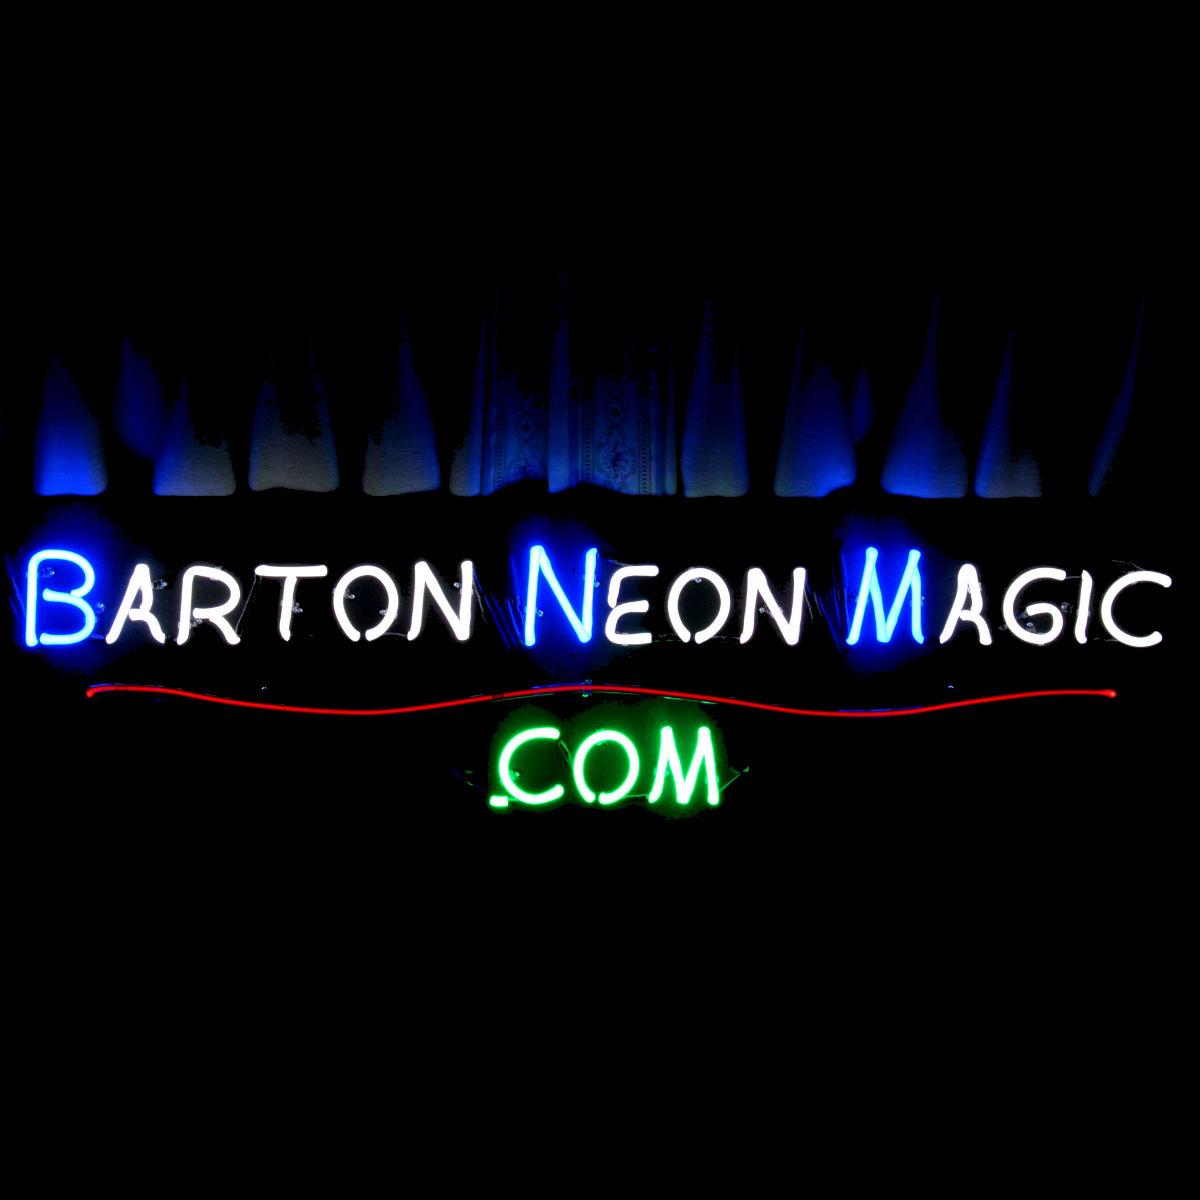 HORSE RACING NEON ART by John Barton - BartonNeonMagic.com